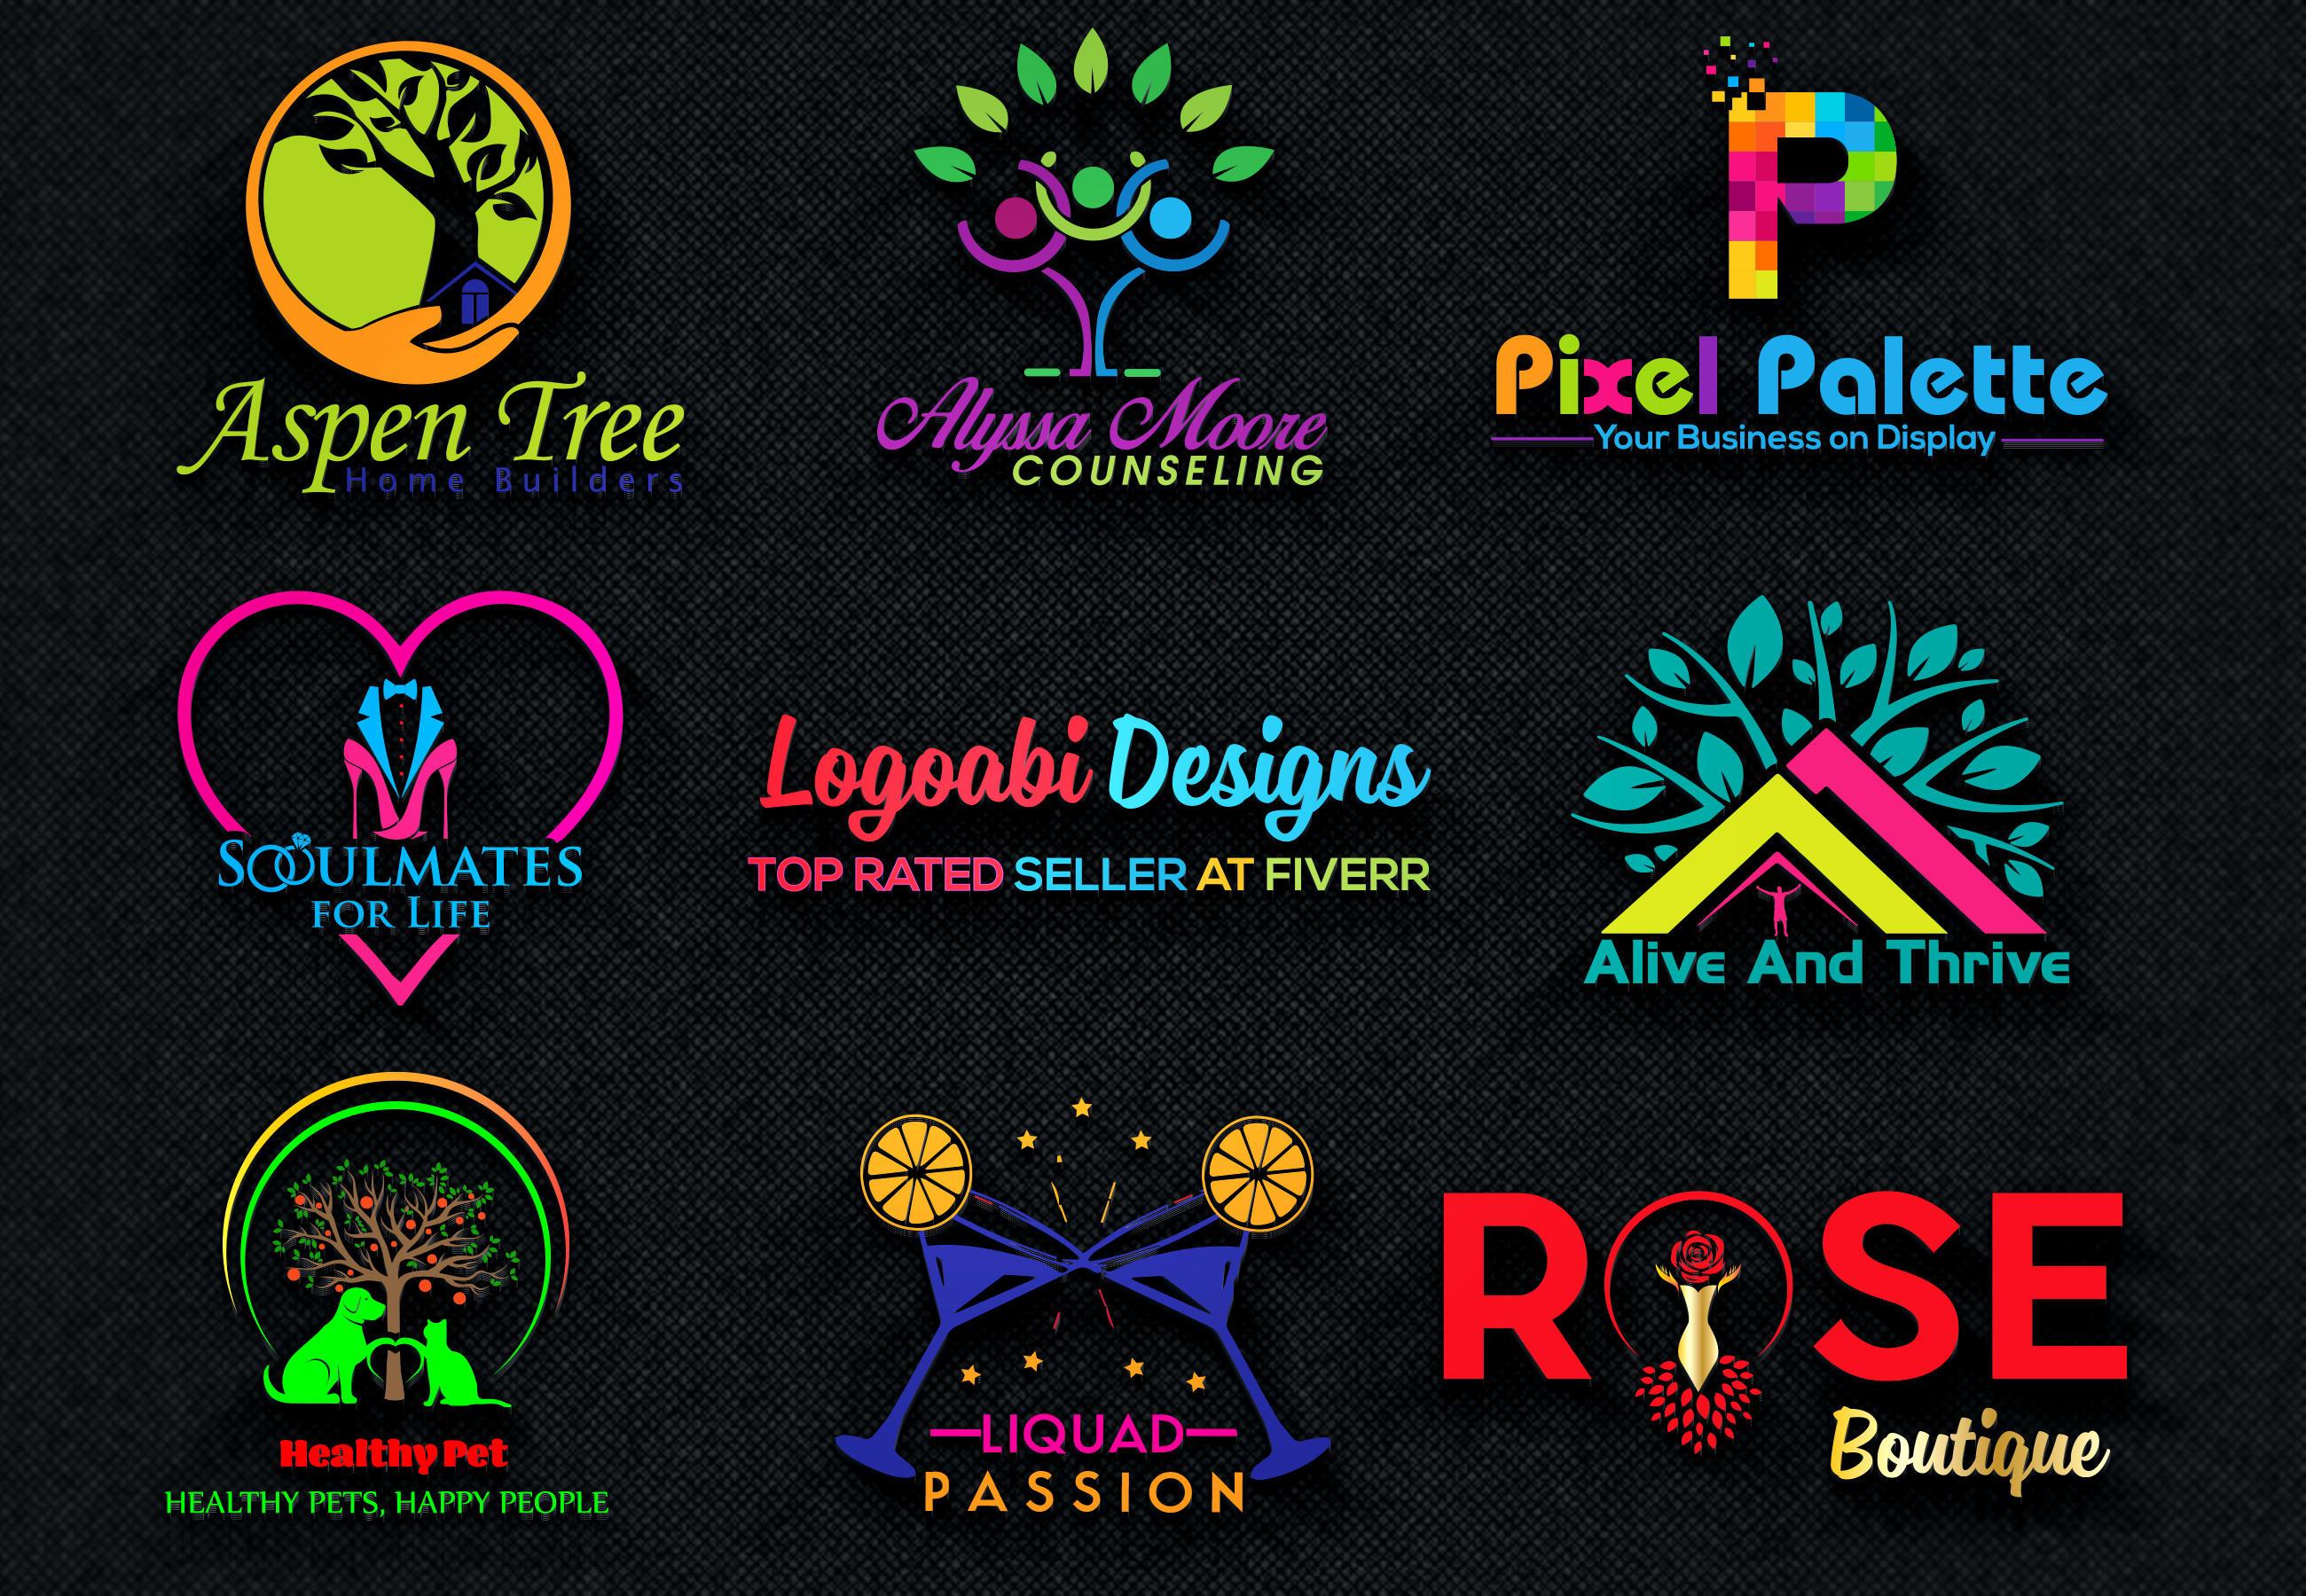 I will design 4 clean modern and minimalist logo